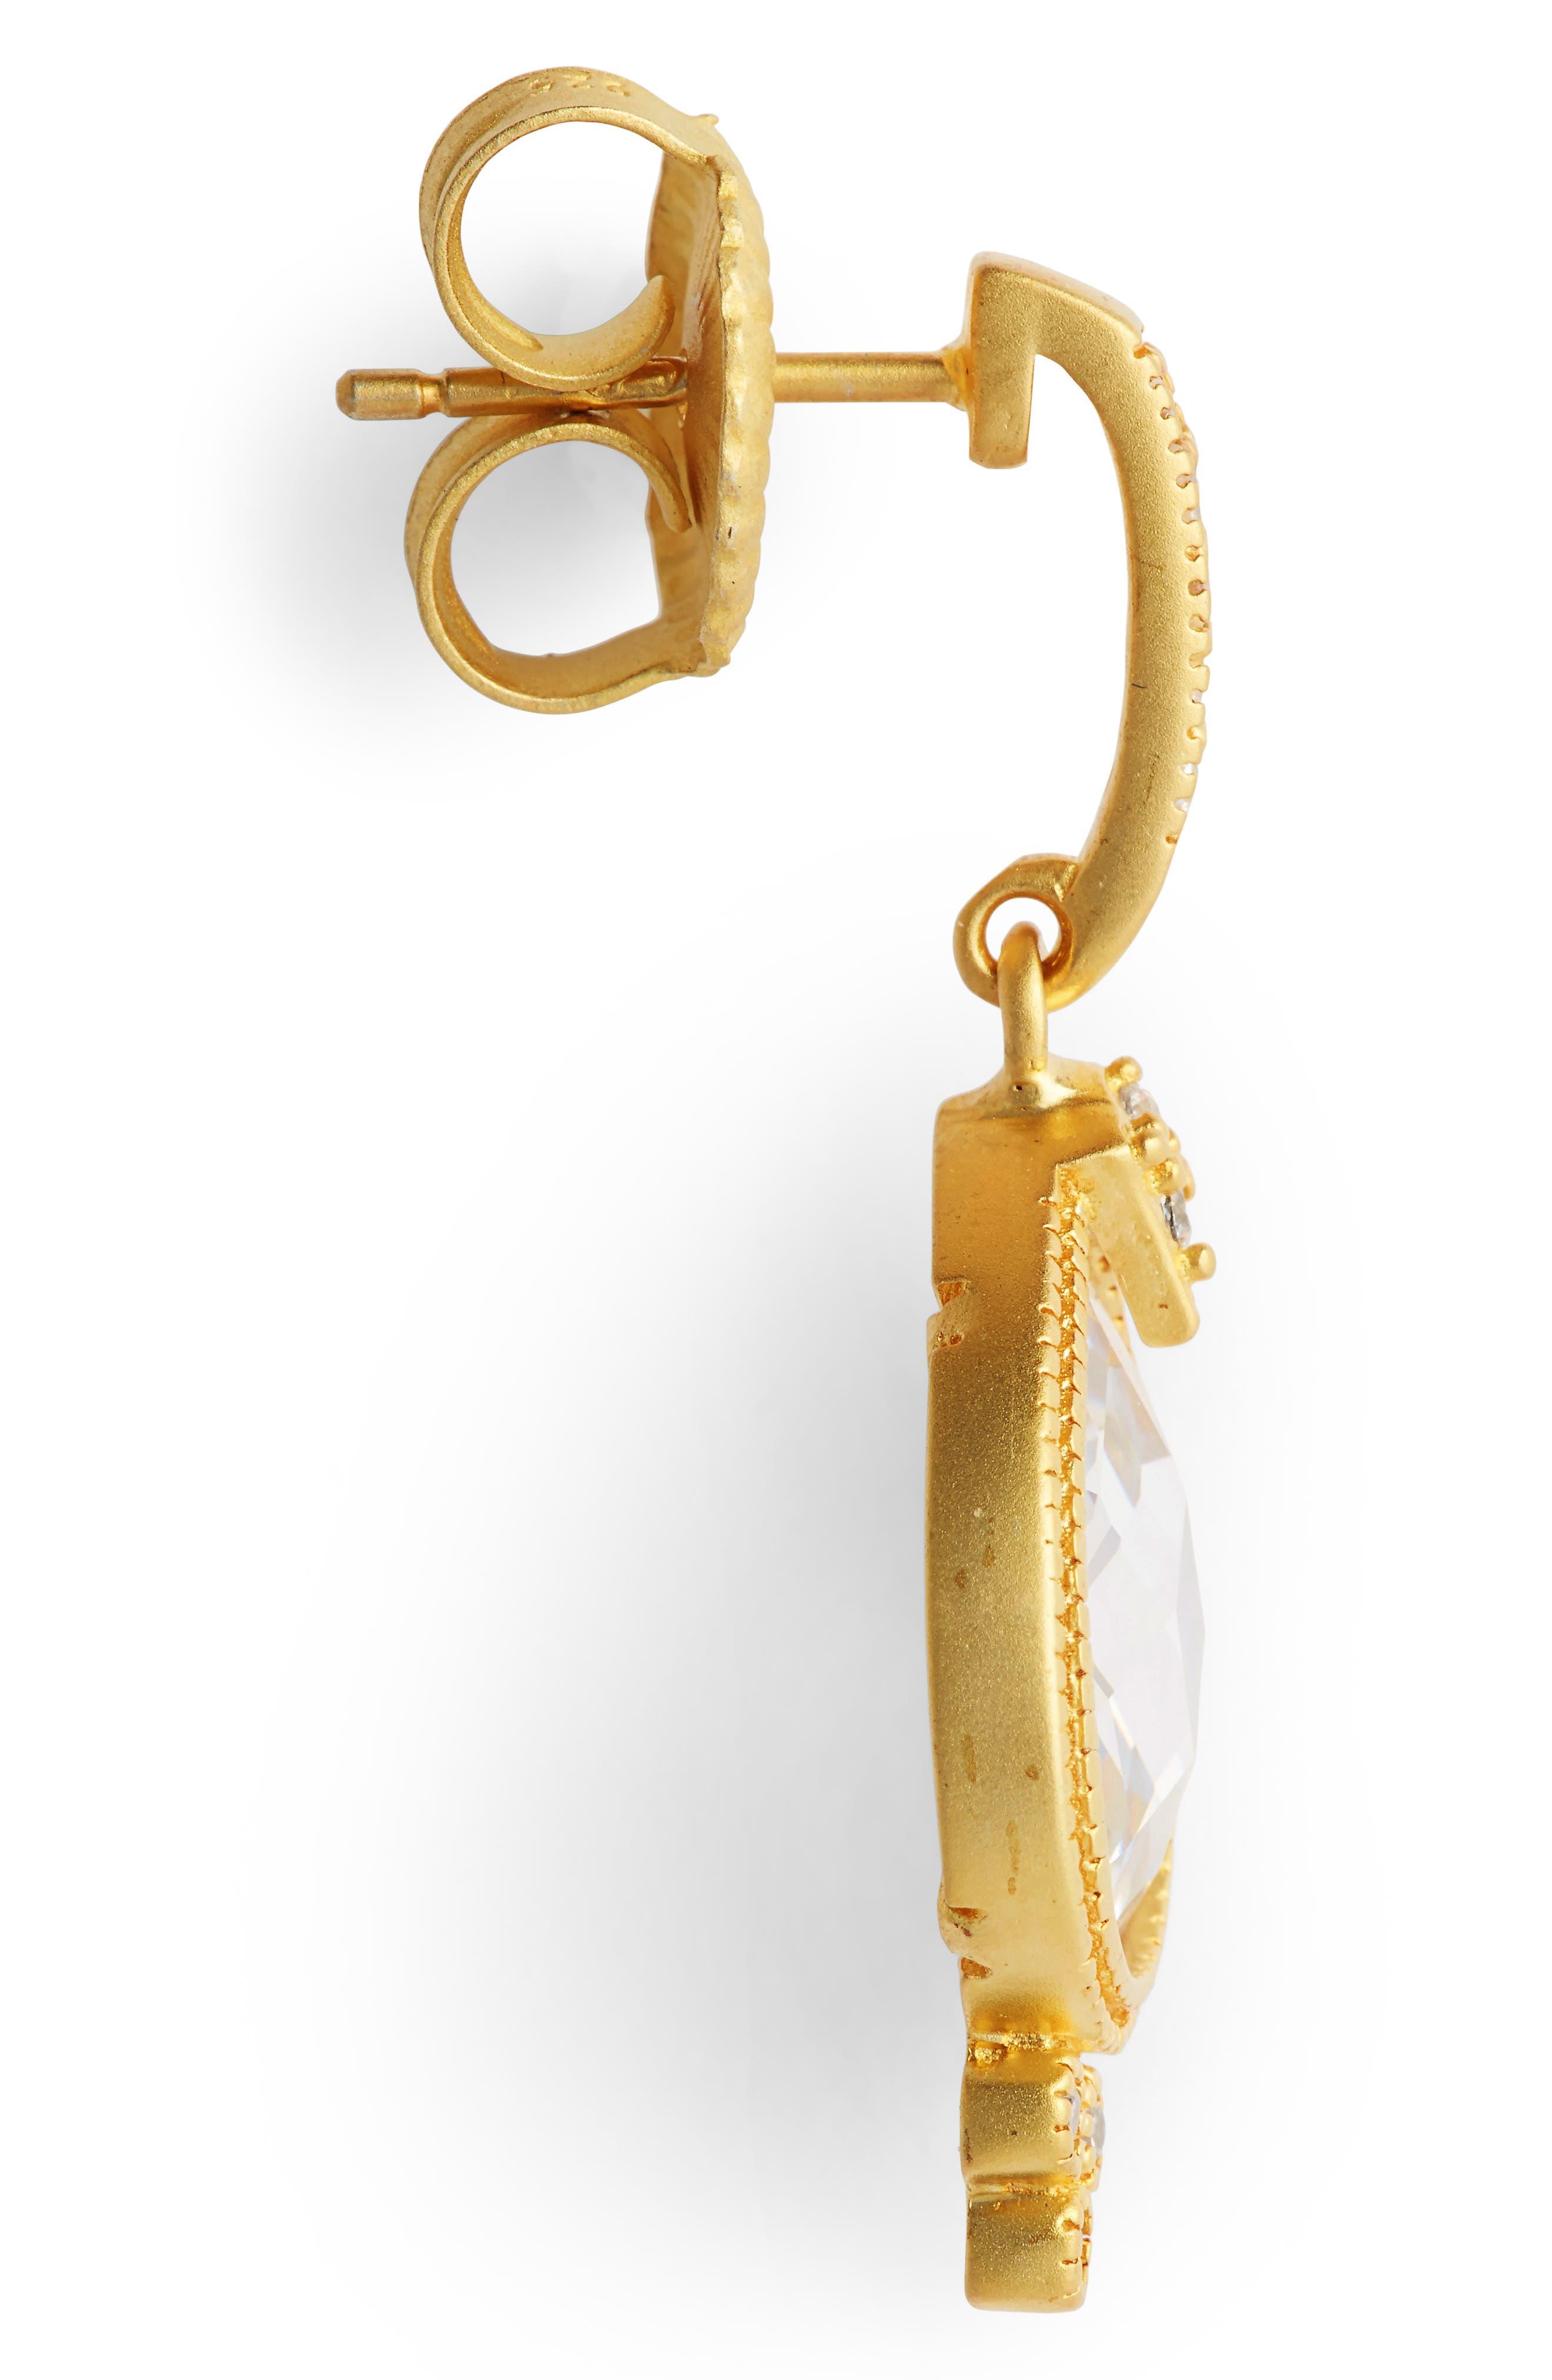 Audrey Teardrop Earrings,                             Alternate thumbnail 4, color,                             710